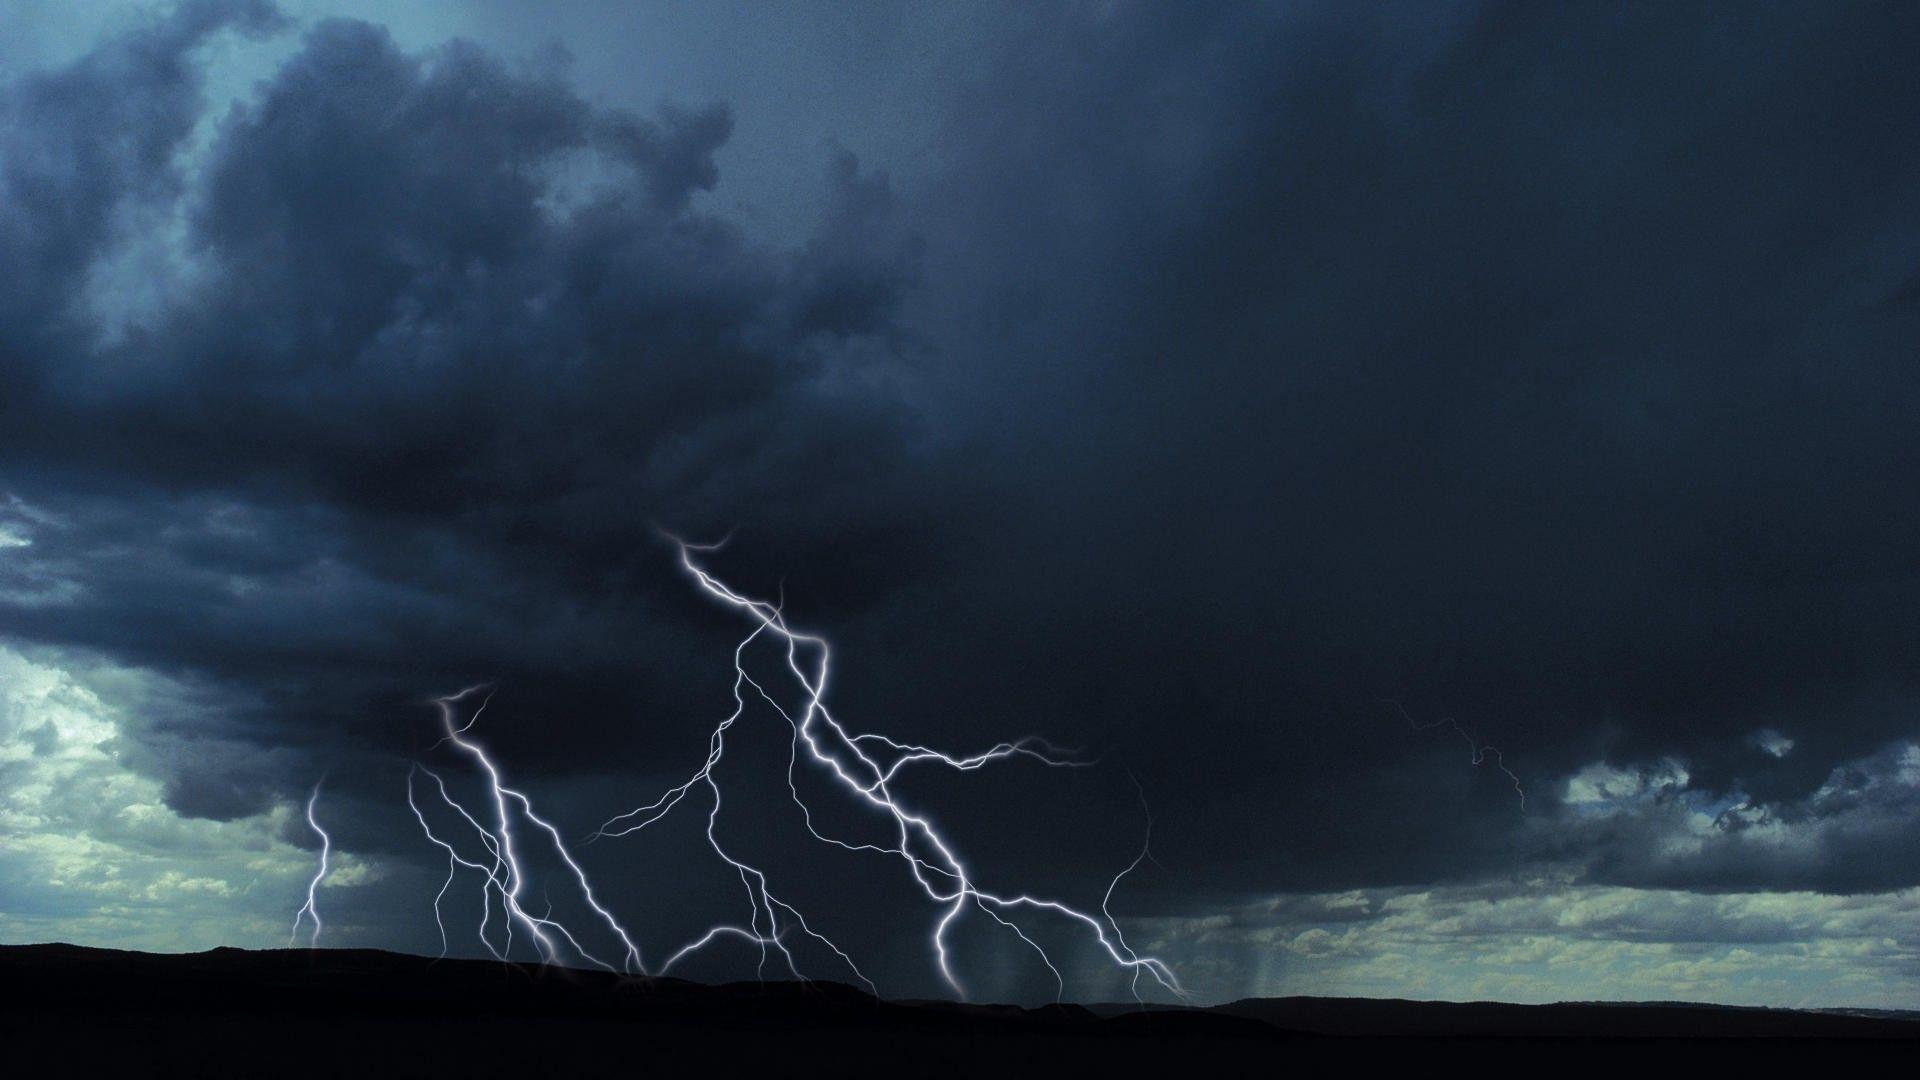 thunderhead clouds wallpaper - photo #34